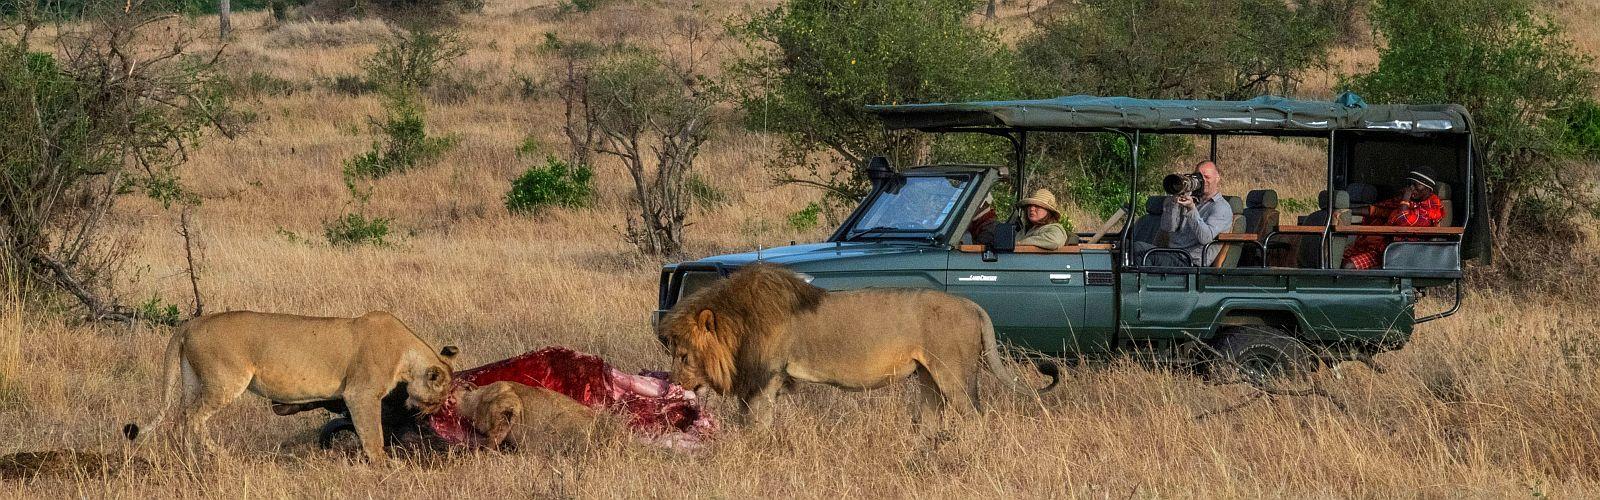 Echte Mannen Safari